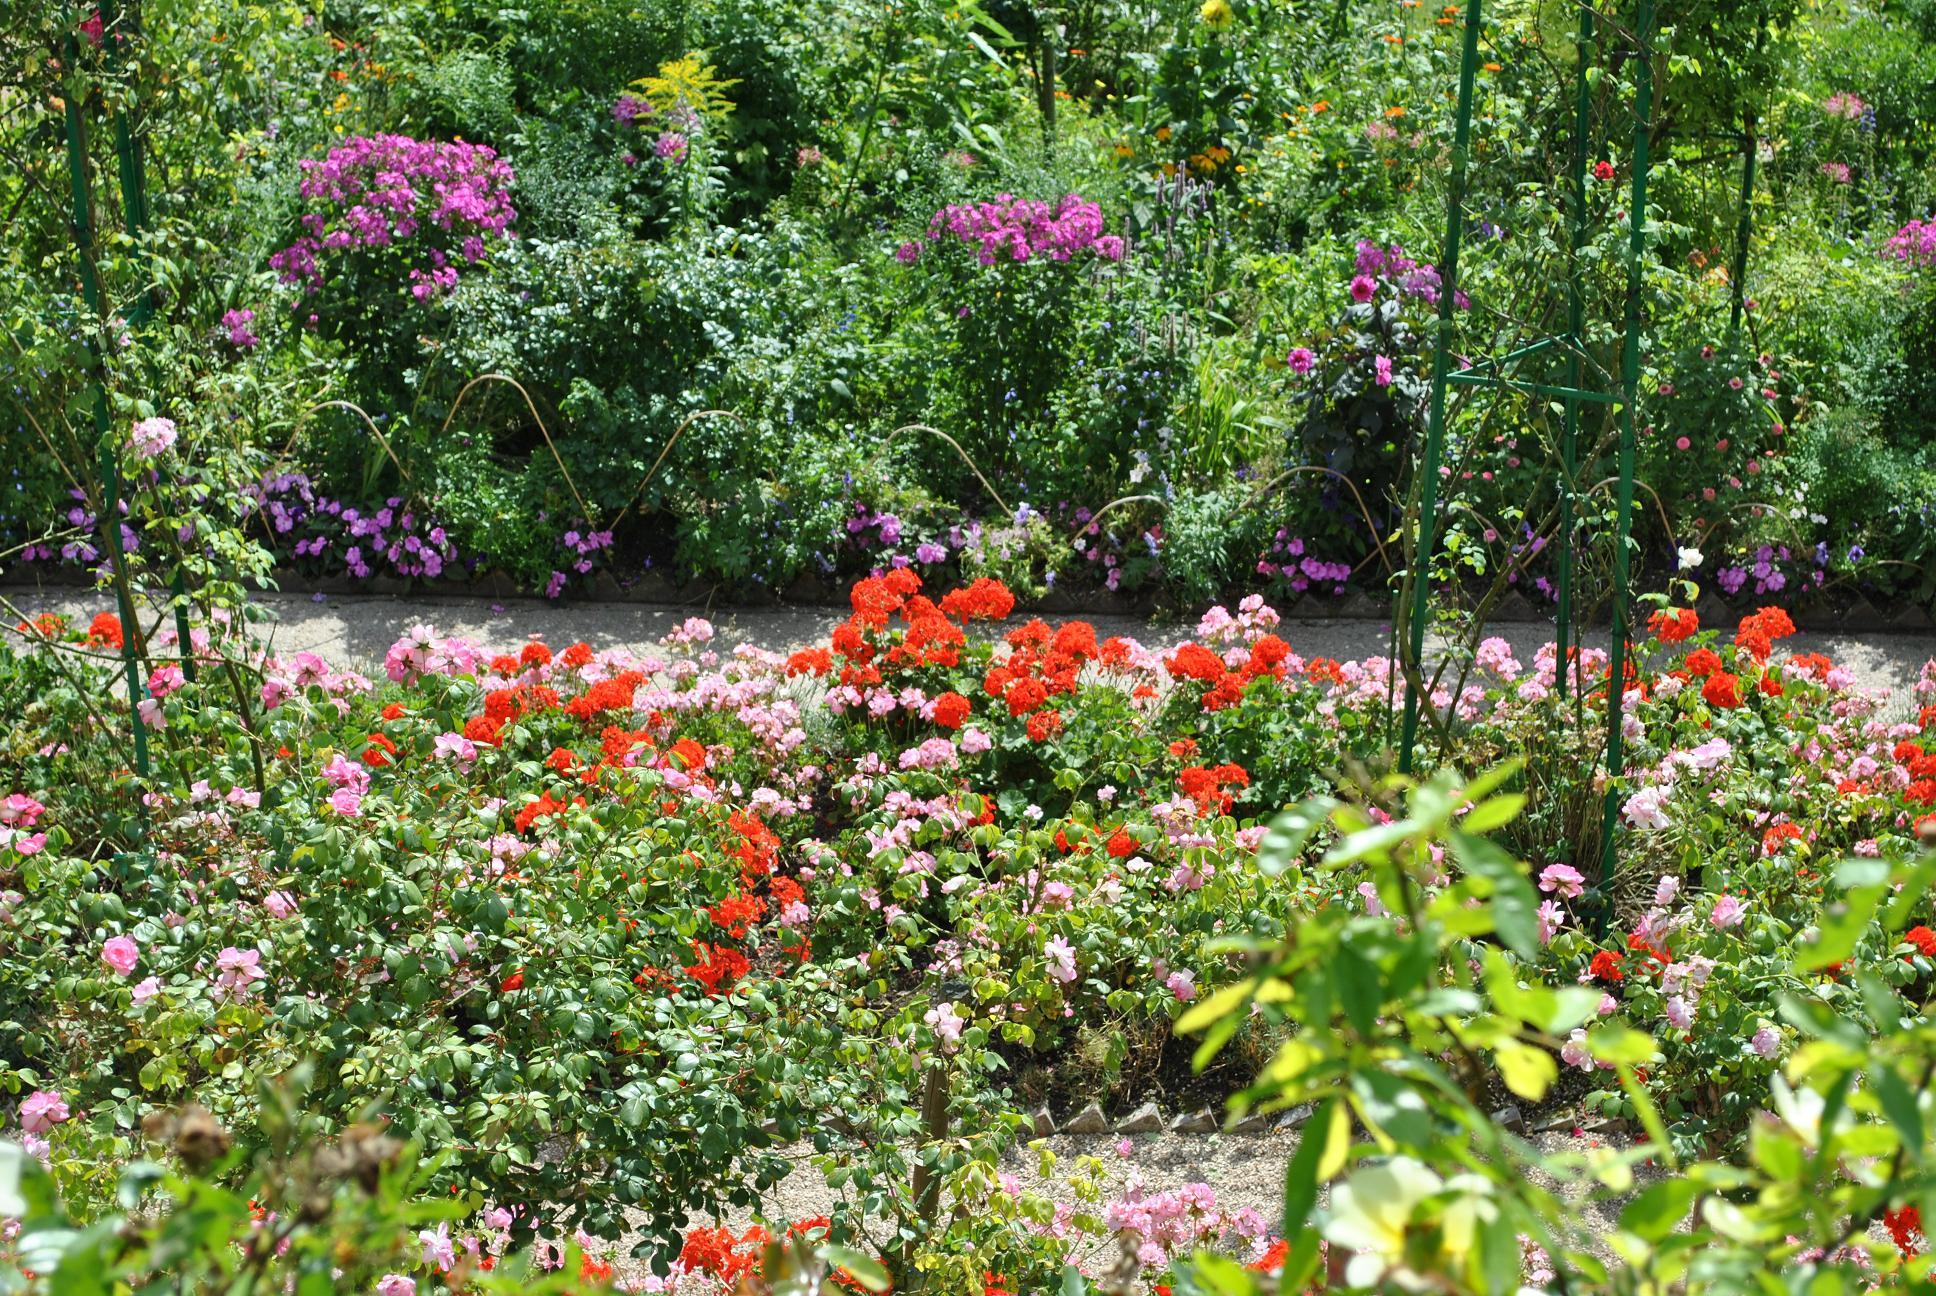 giardino di monet giverny